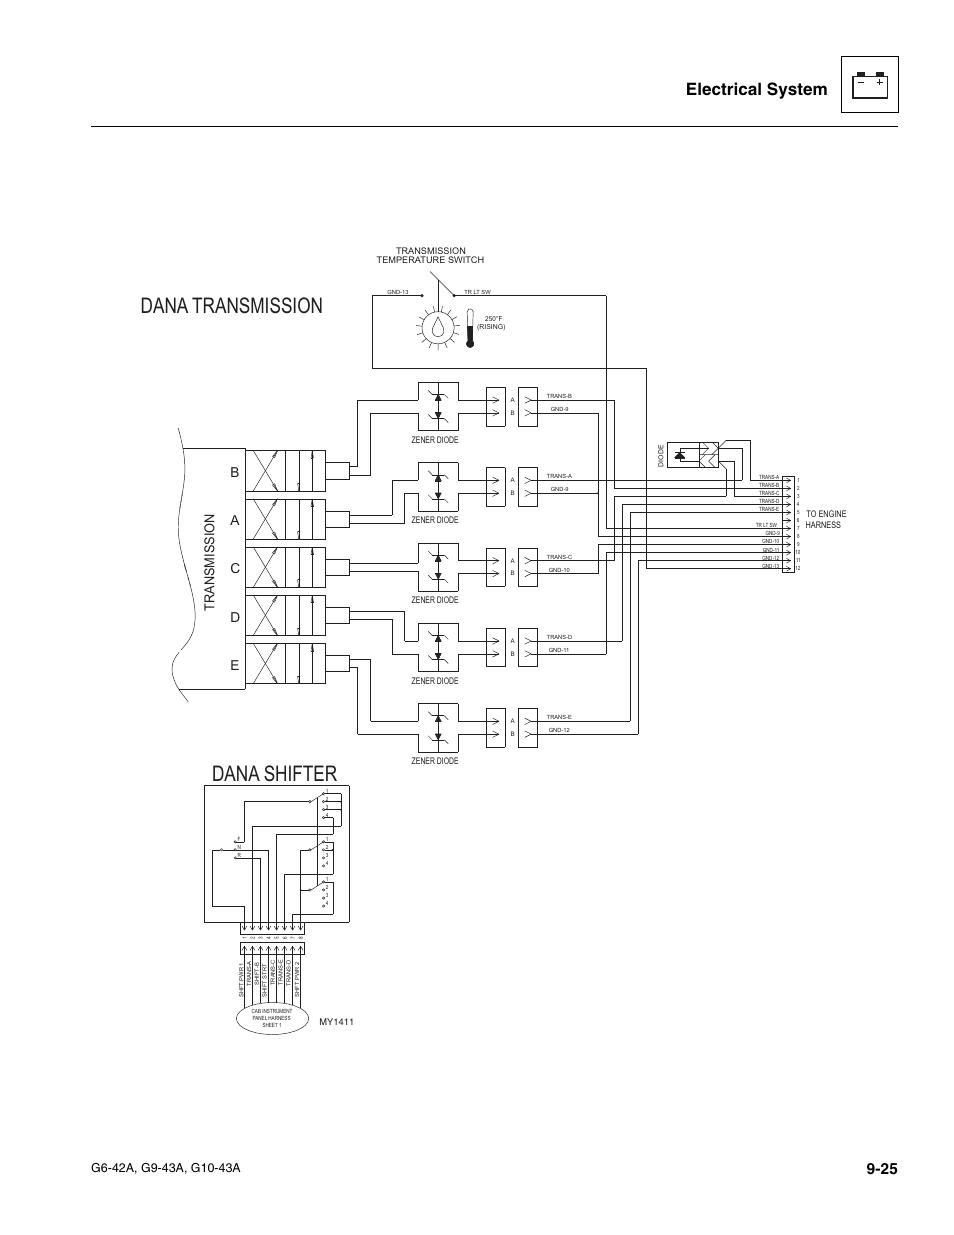 hight resolution of dana transmission dana shifter electrical system jlg g6 42a service manual user manual